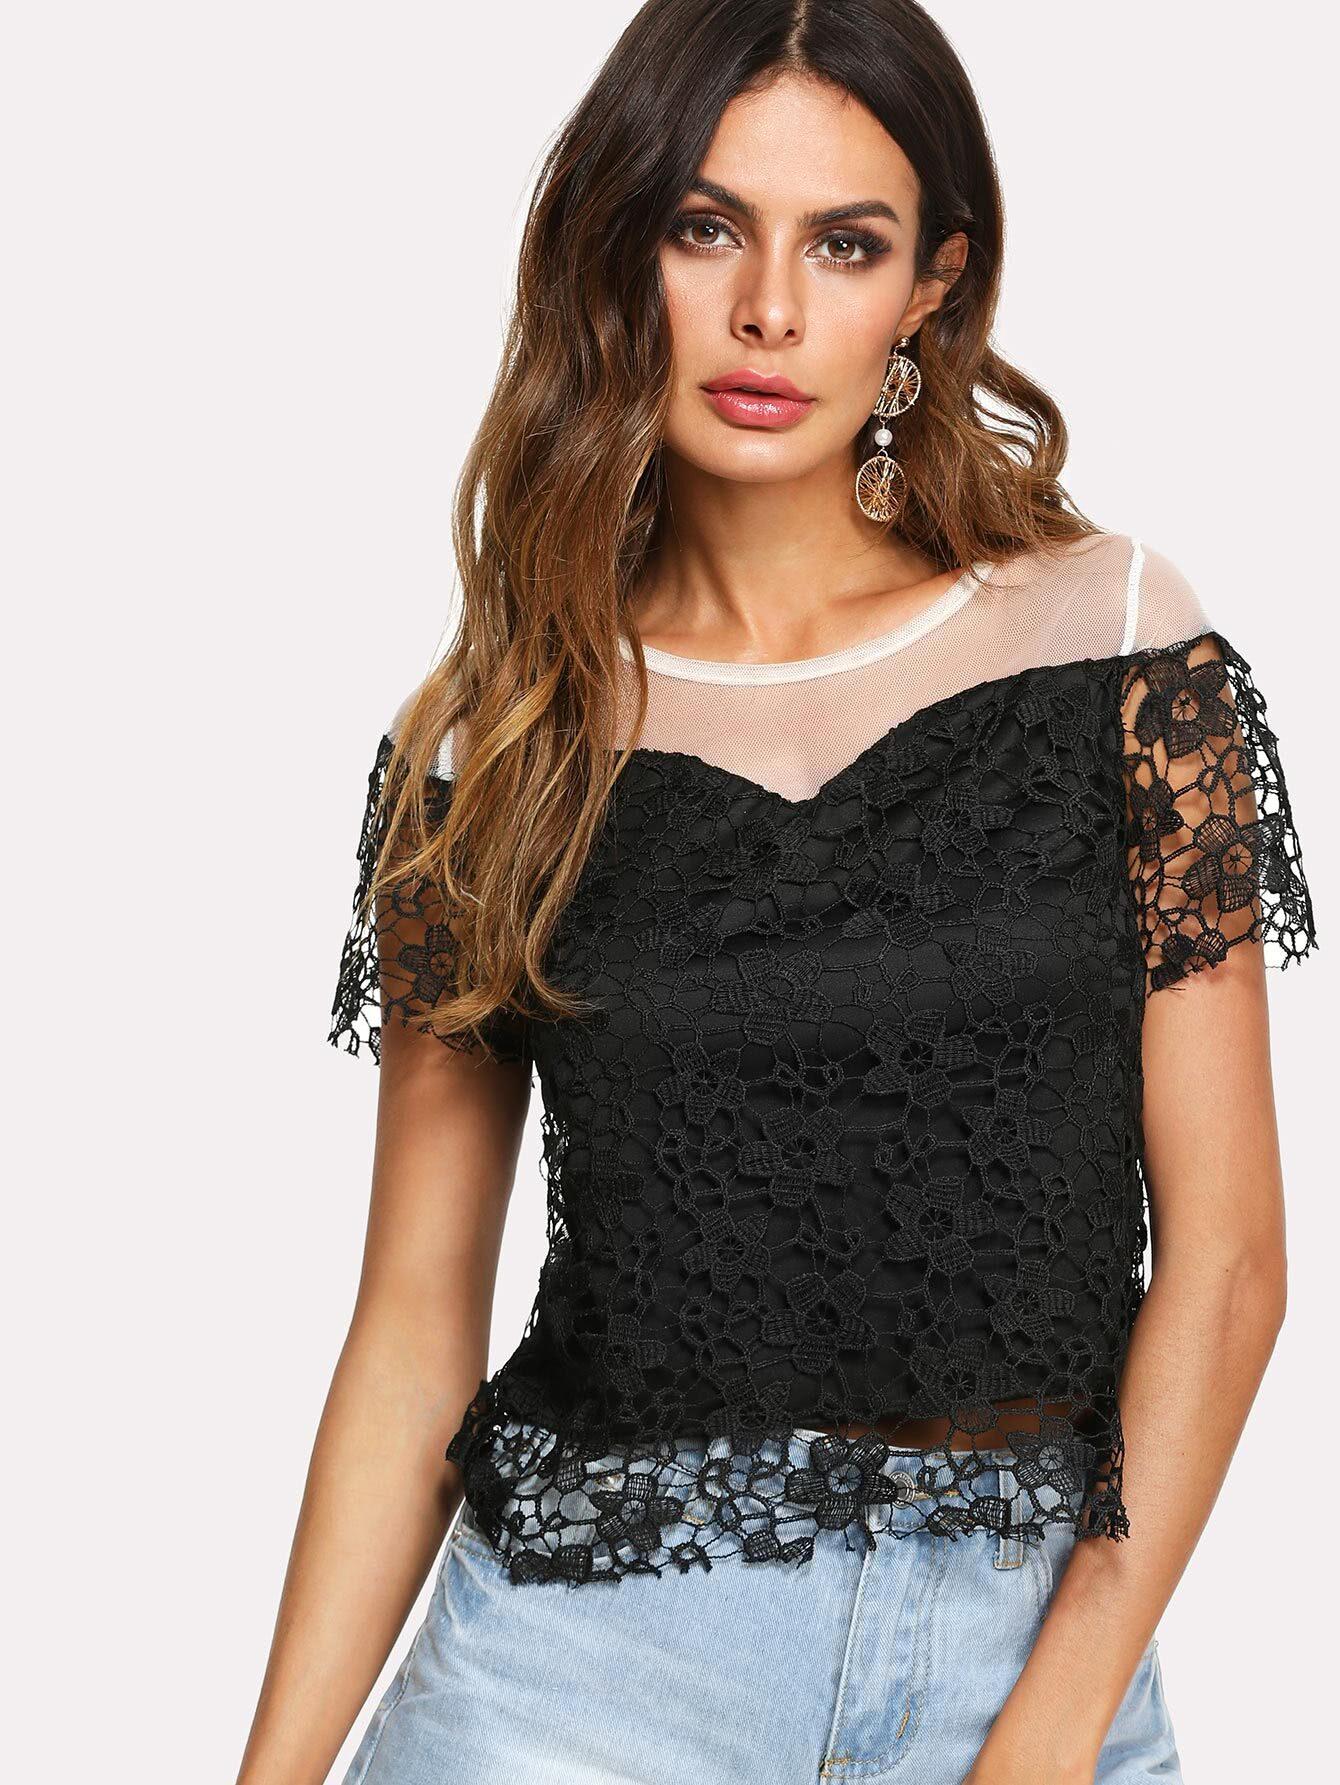 Mesh Contrast Lace Top mesh contrast lace top